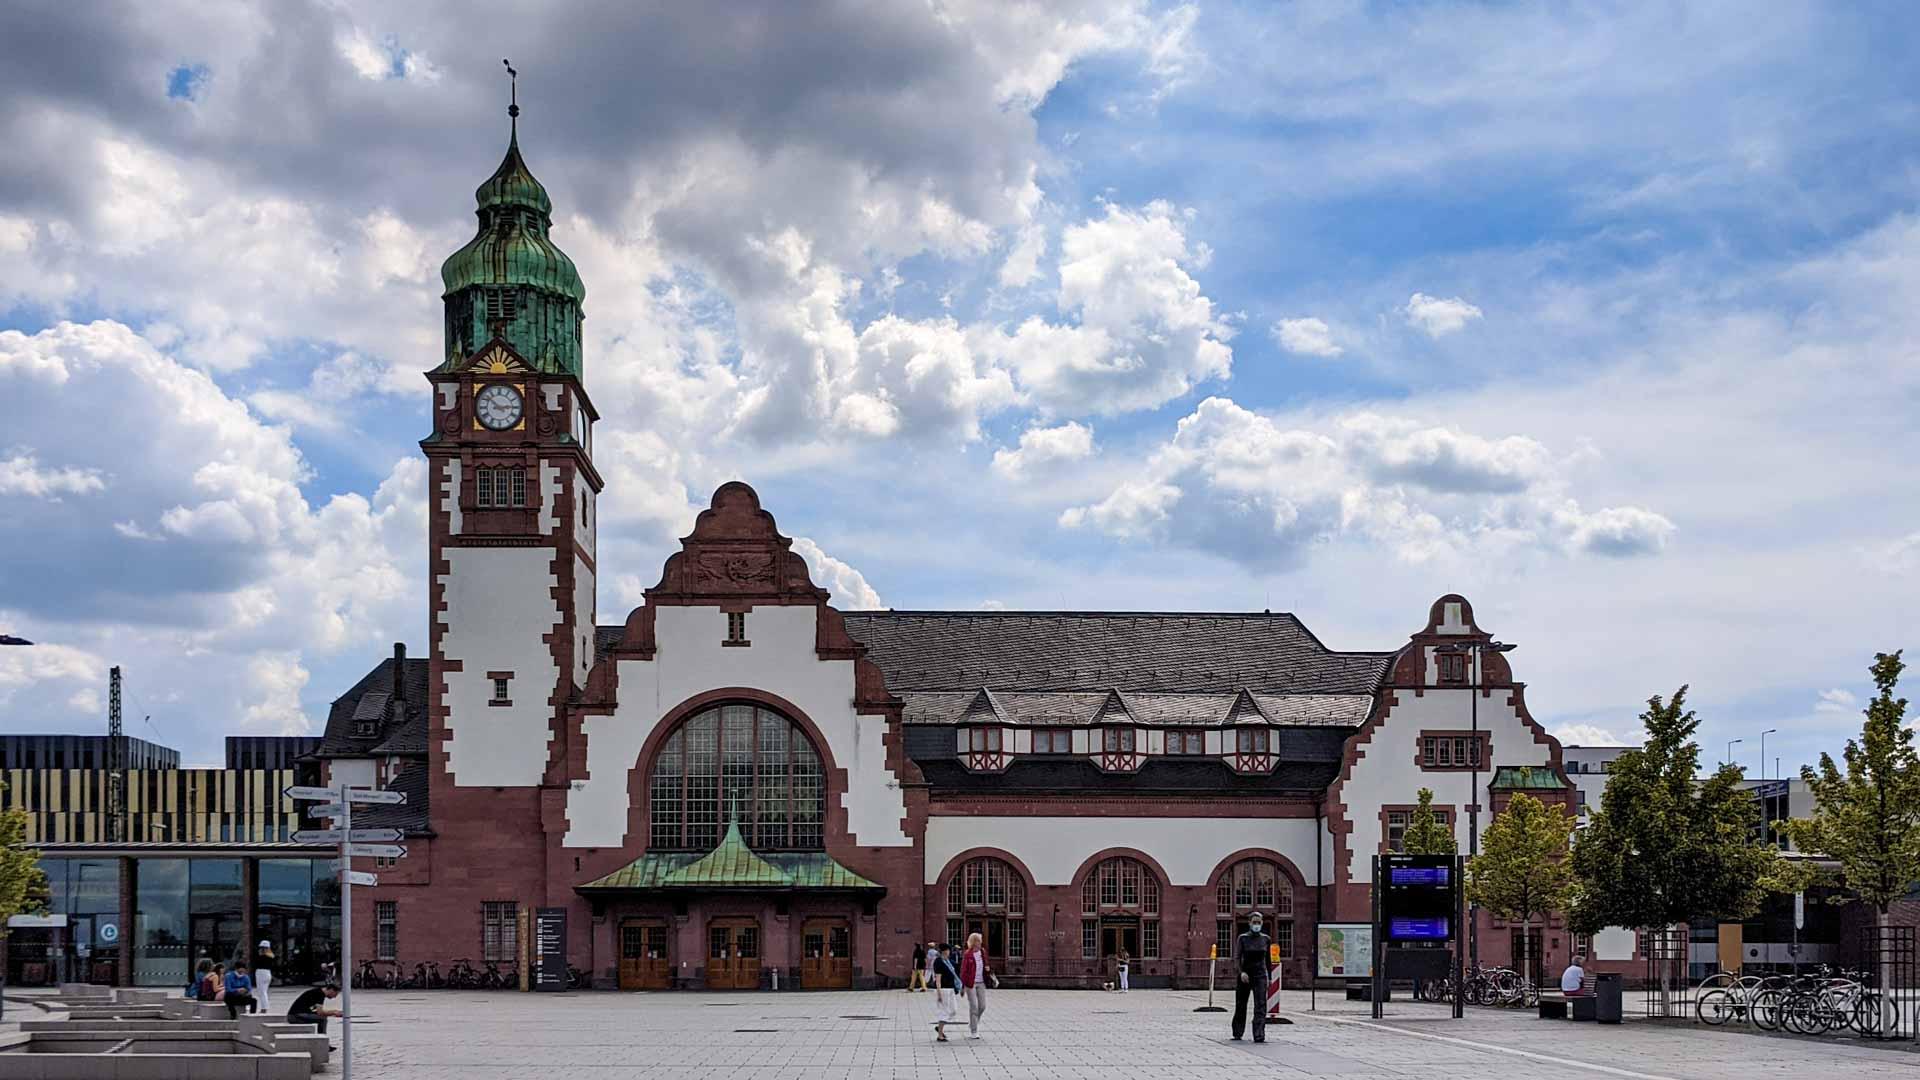 Main Station of Bad Homburg